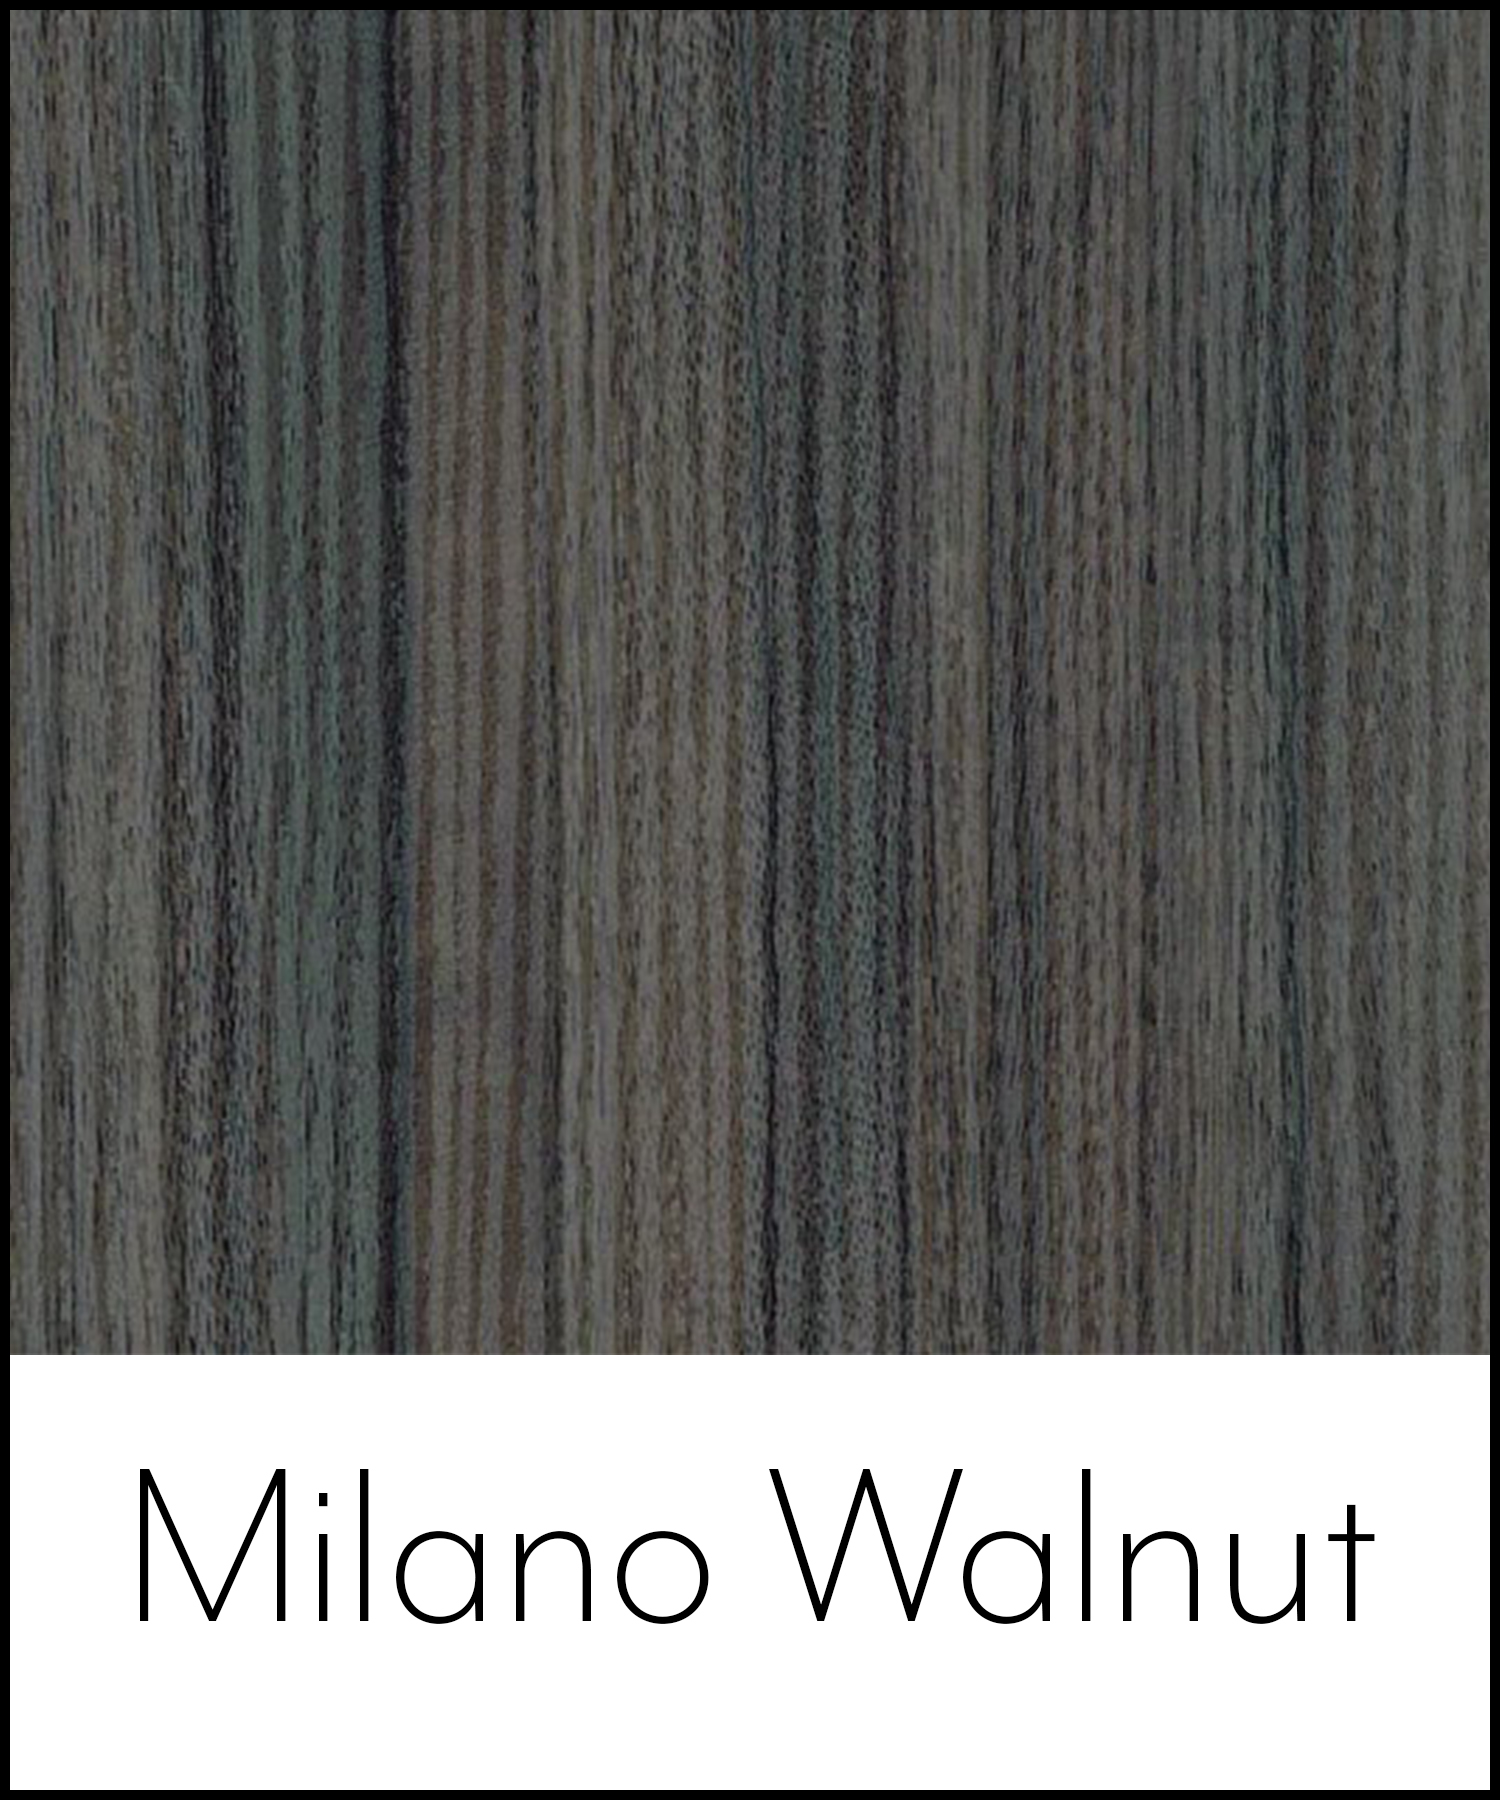 MIlano Walnut.jpg